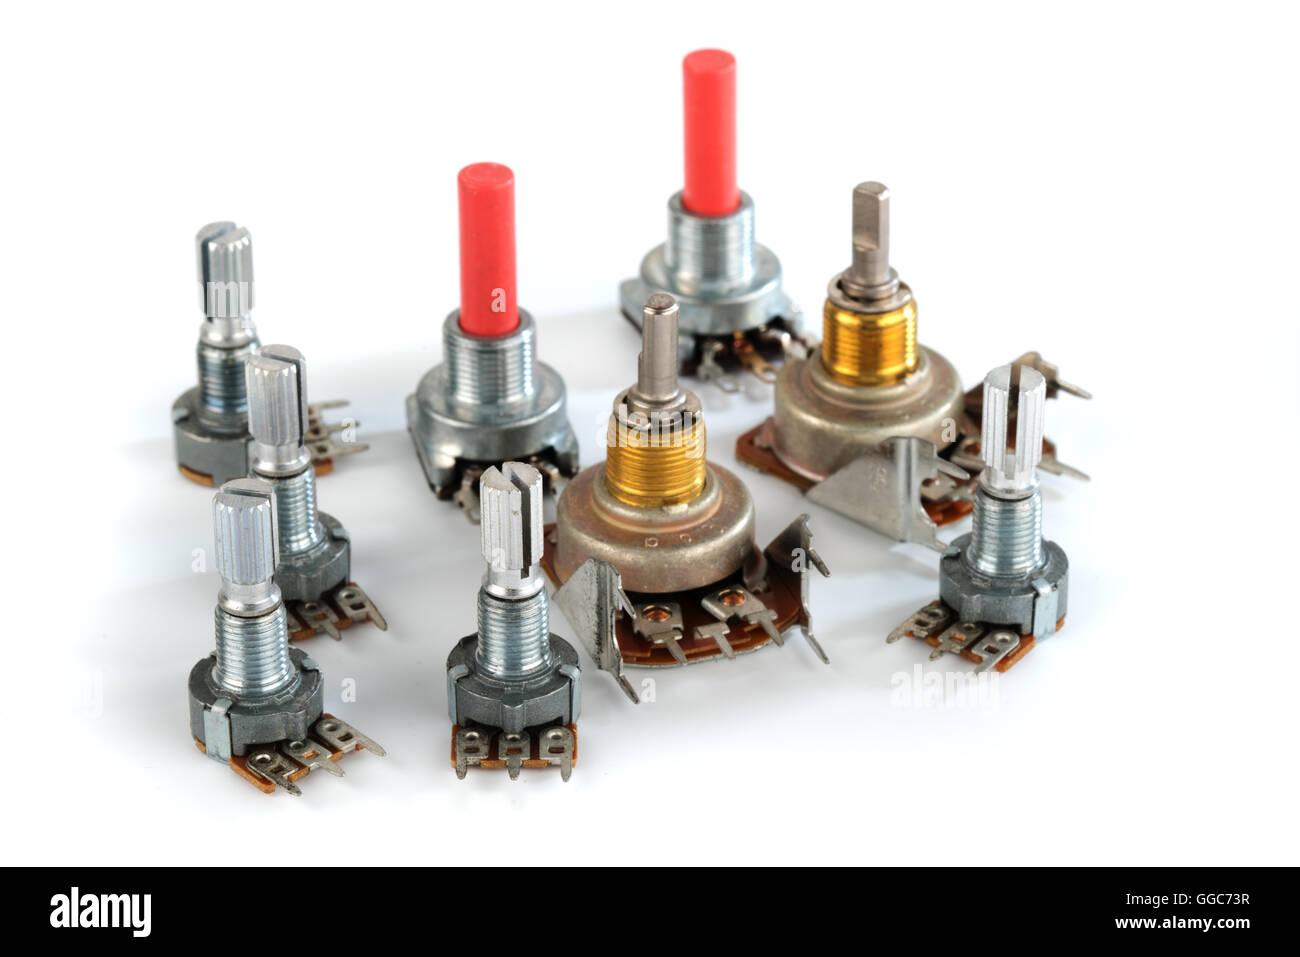 potentiometer variable resistor or rheostat. - Stock Image